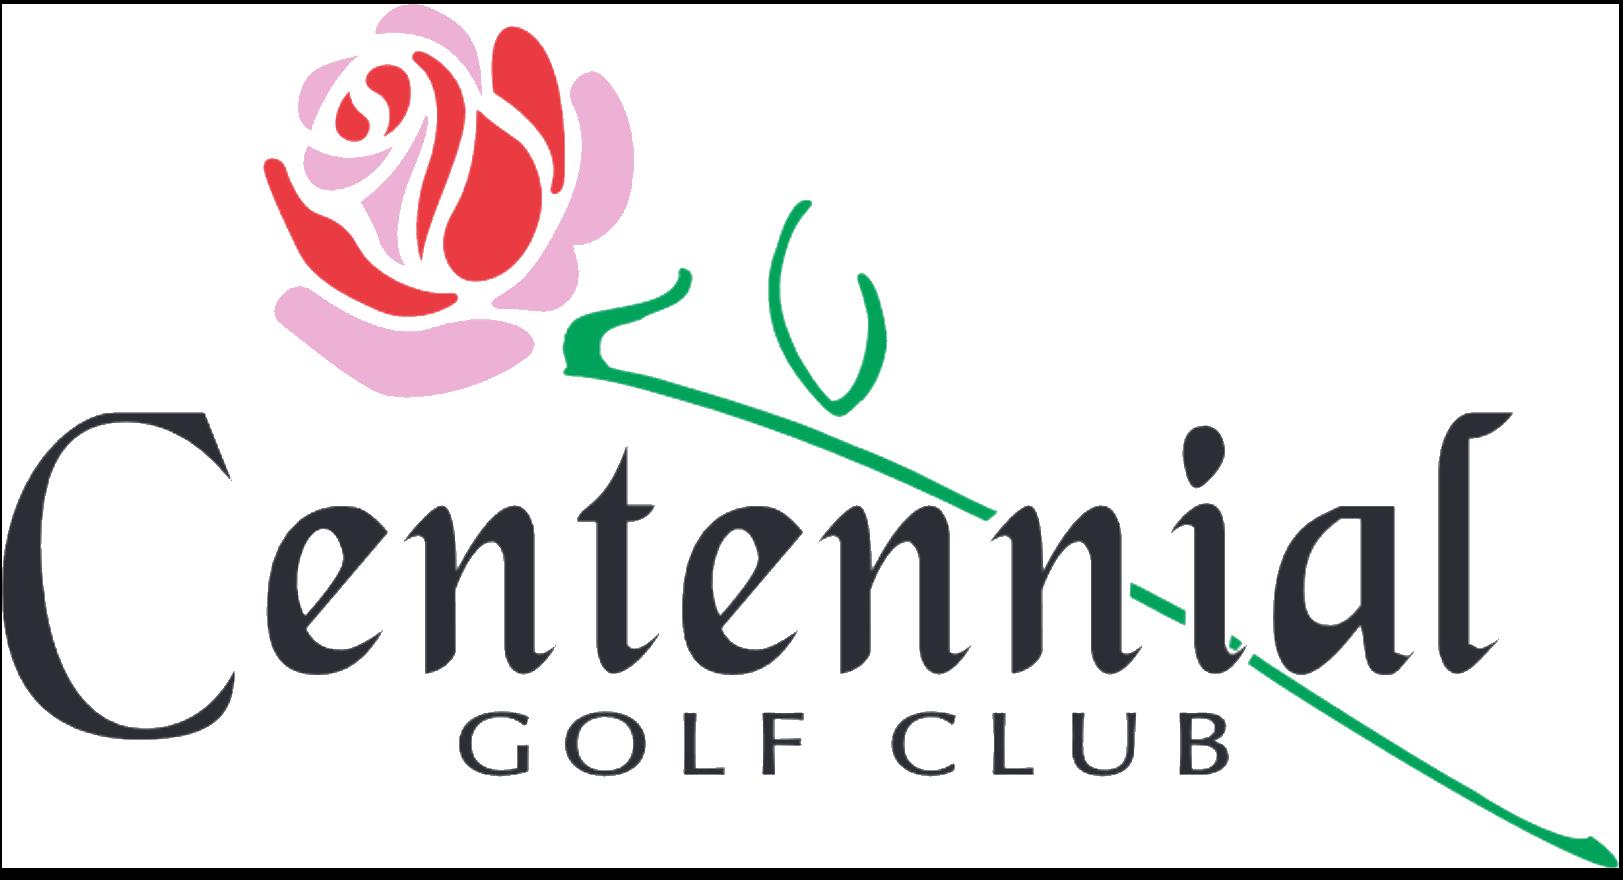 Centennial Golf Club Logo Header